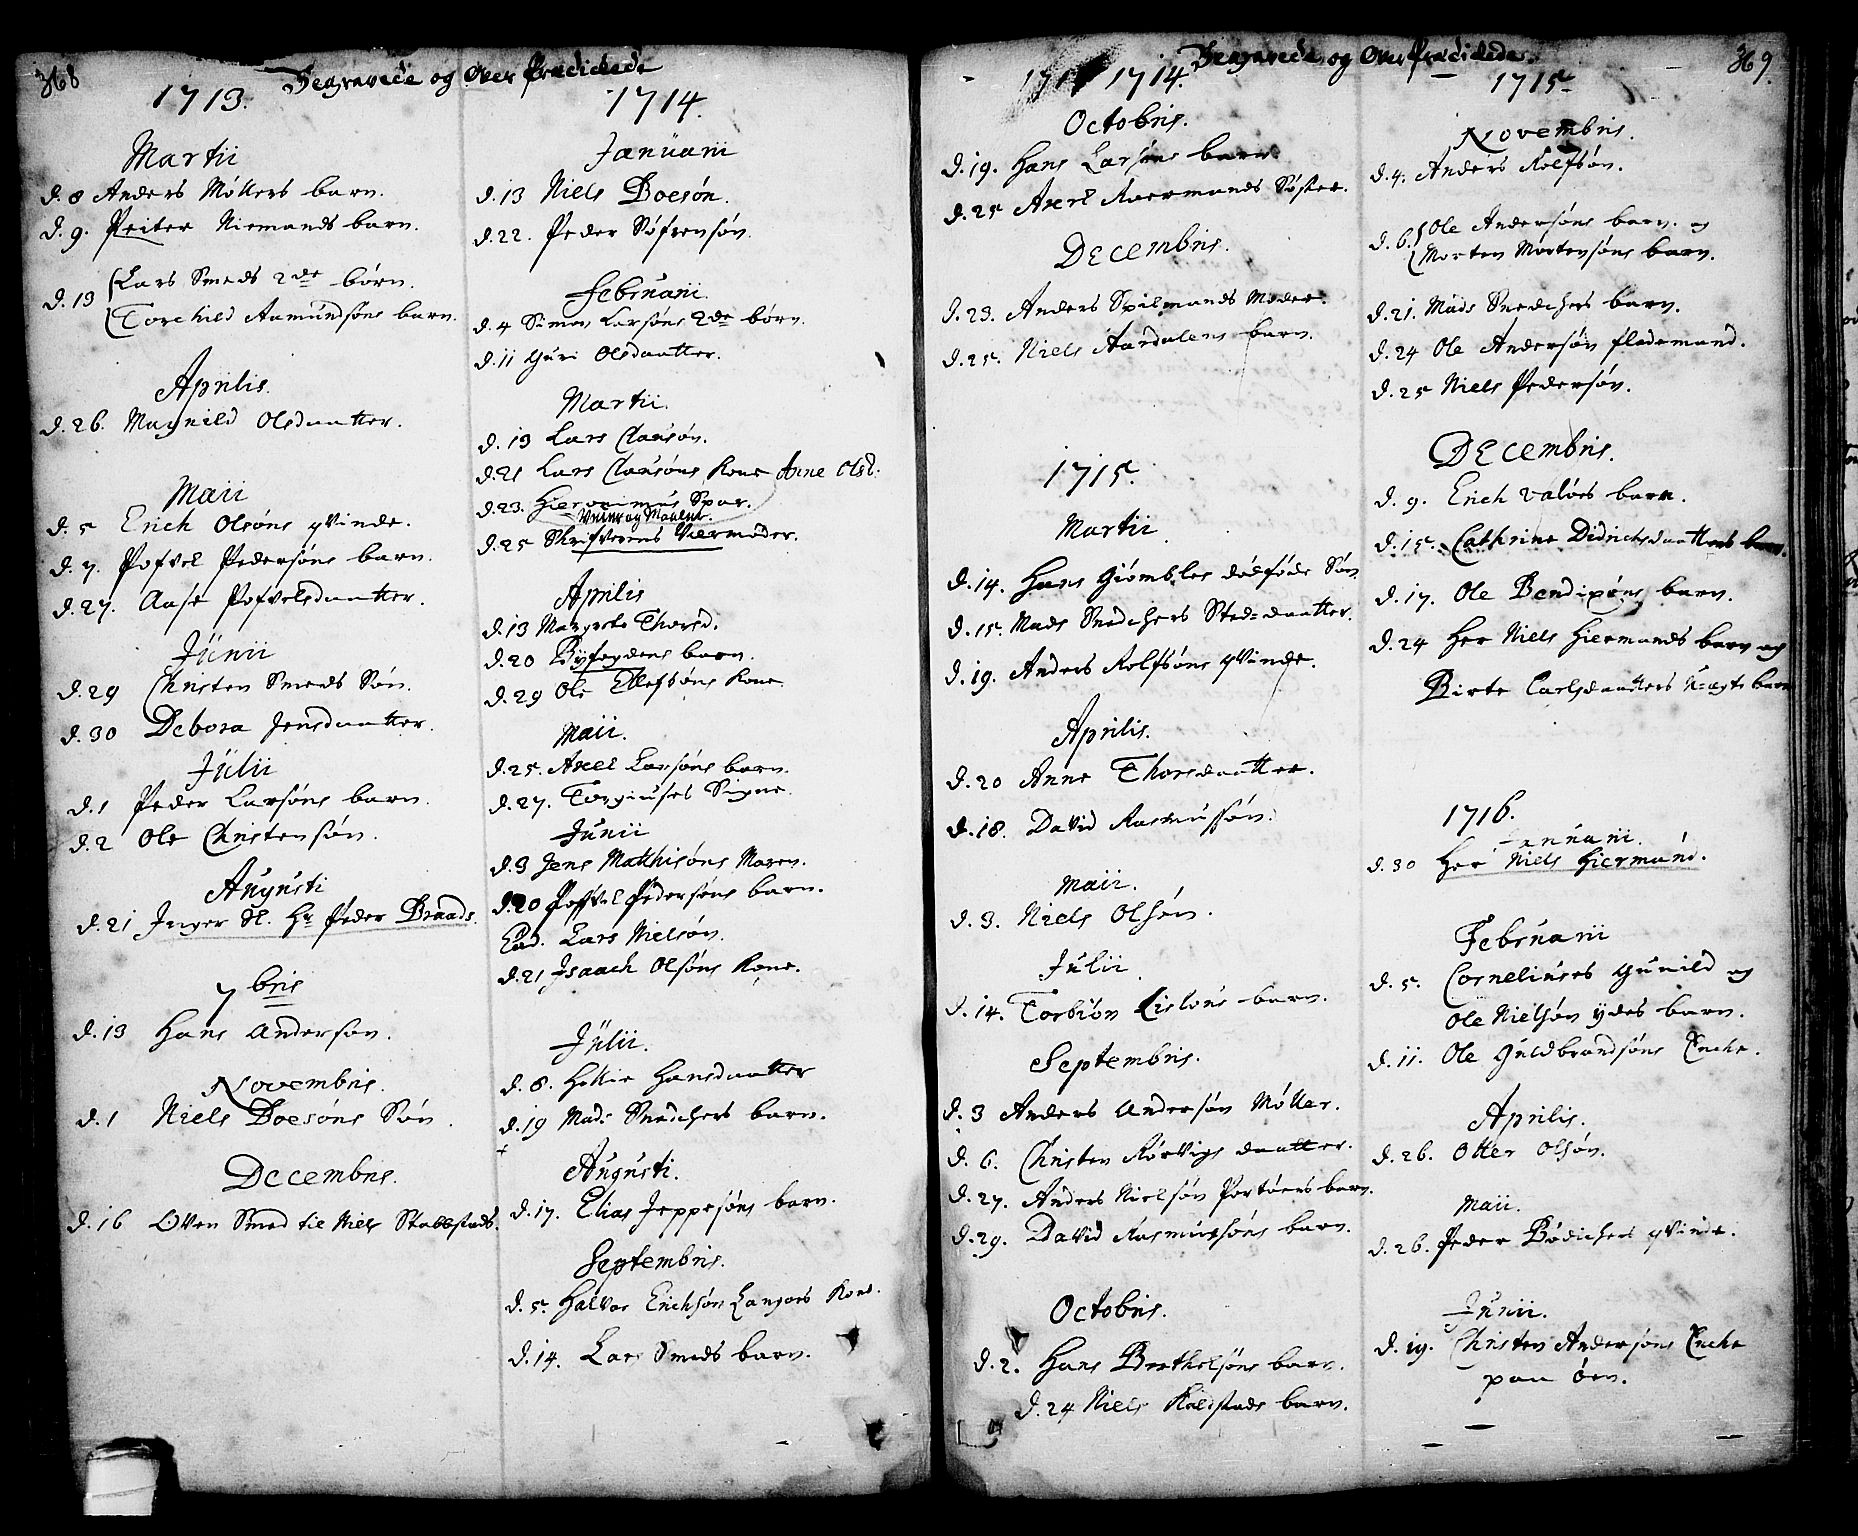 SAKO, Kragerø kirkebøker, F/Fa/L0001: Ministerialbok nr. 1, 1702-1766, s. 368-369